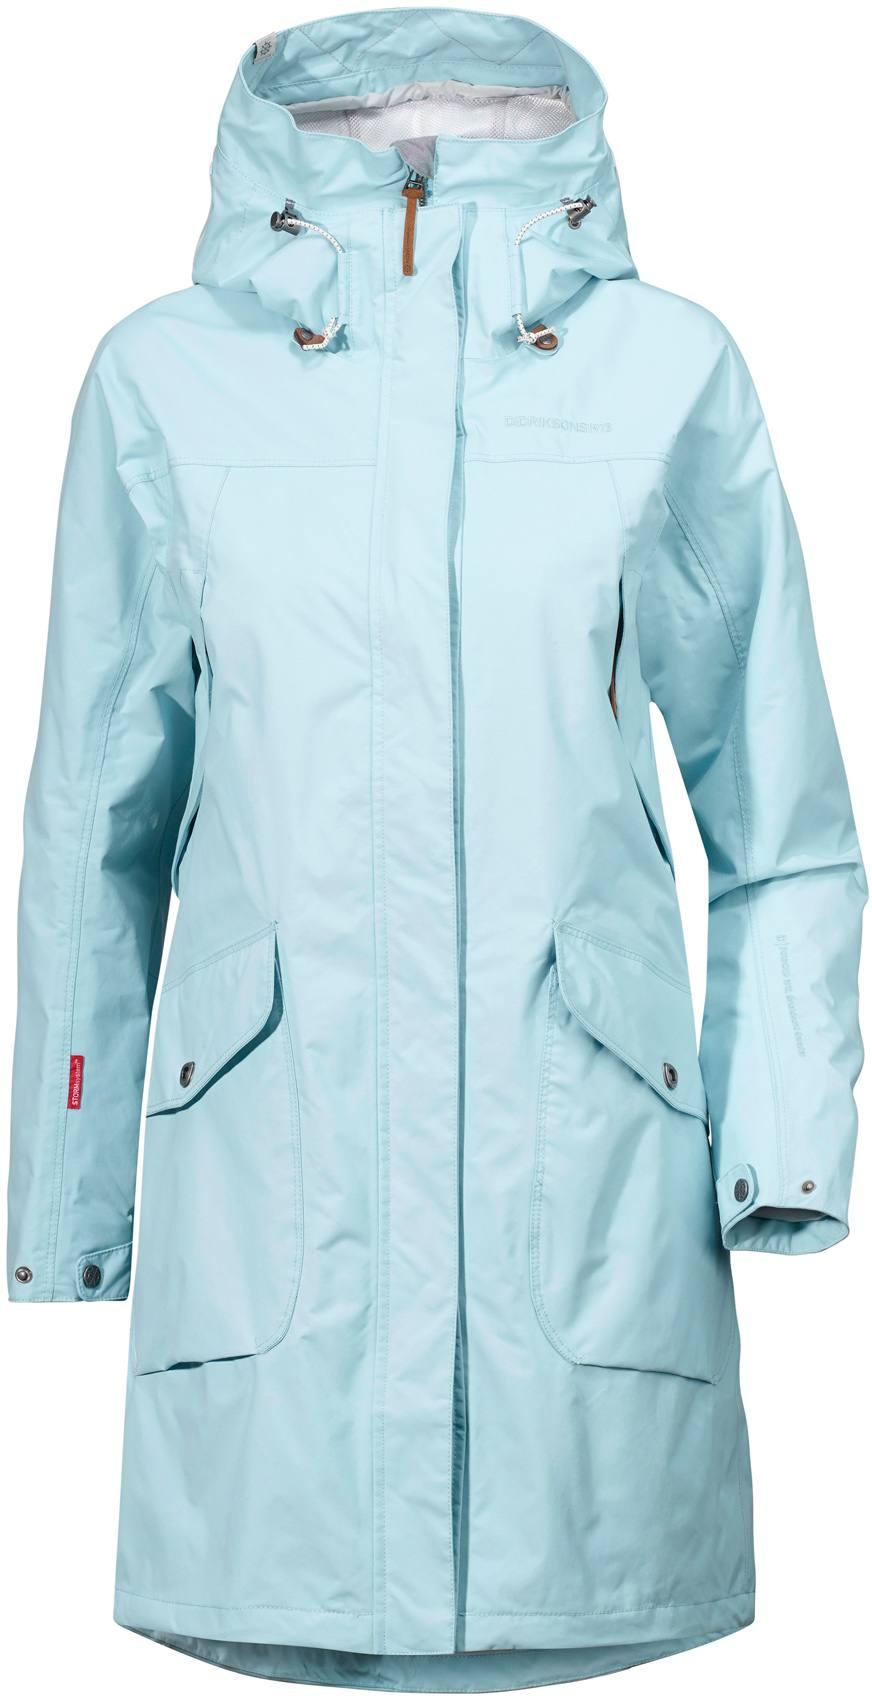 932d8a2dca6 Didriksons Thelma Women's Coat | Scandinavian Outdoor